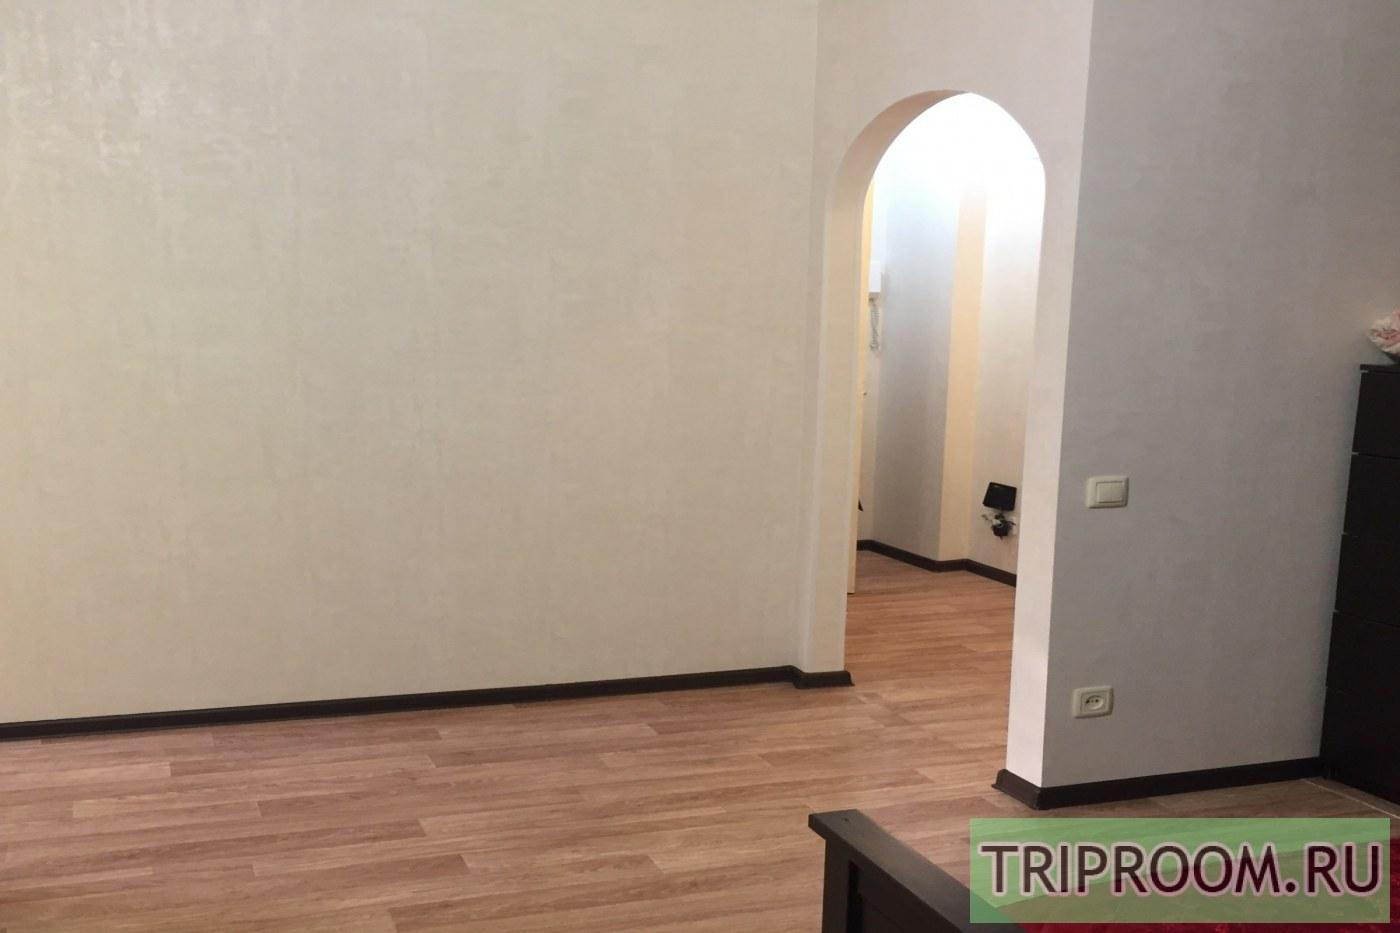 1-комнатная квартира посуточно (вариант № 2841), ул. Коротченко улица, фото № 7